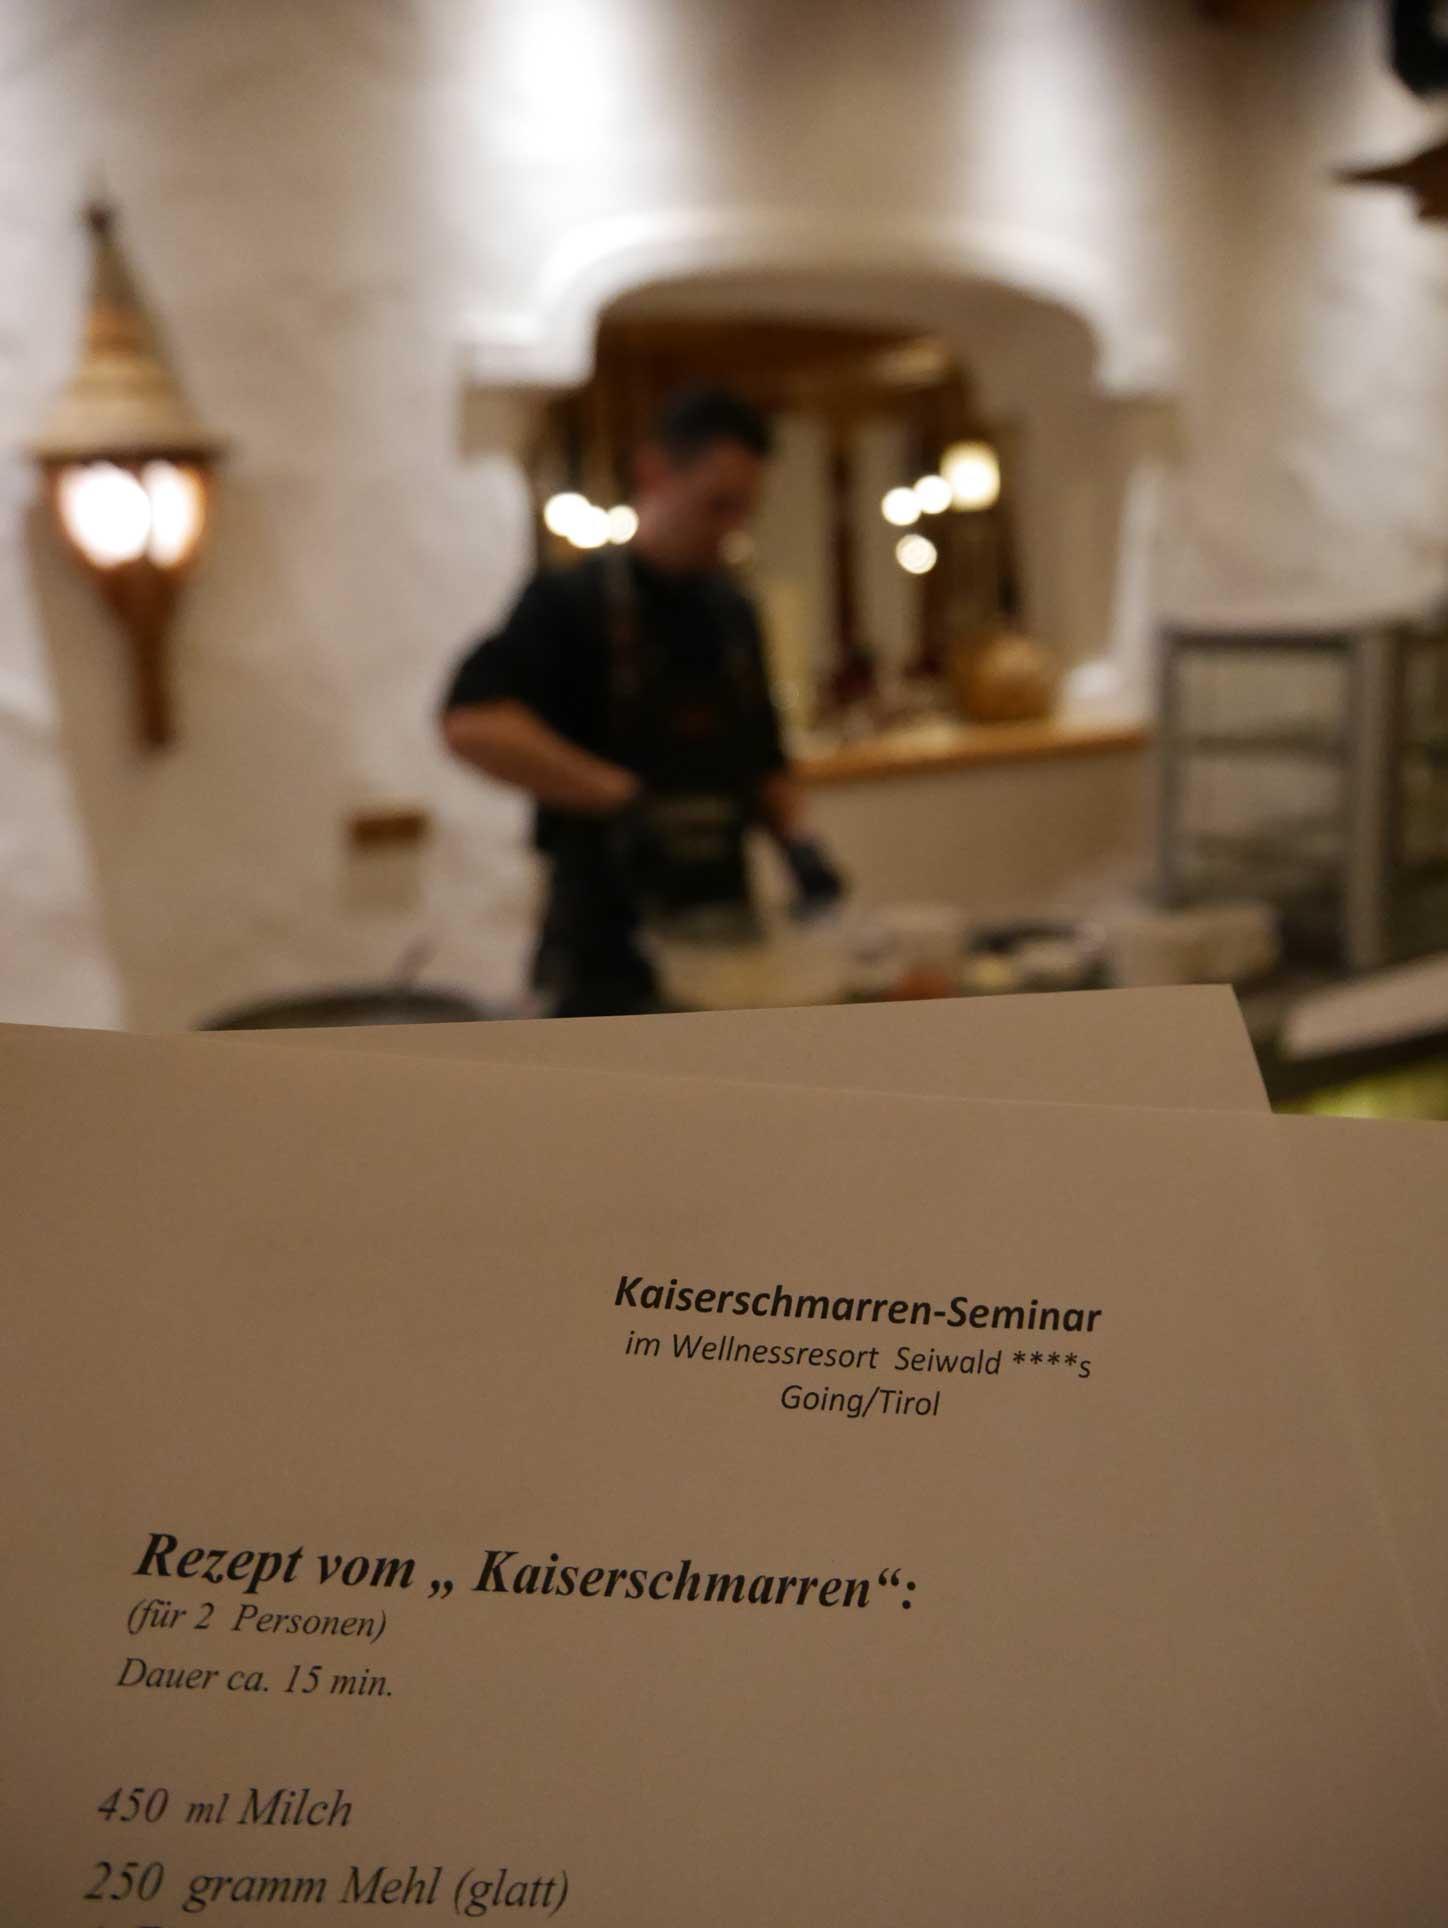 kaiserschmarrn-seminar-hotel